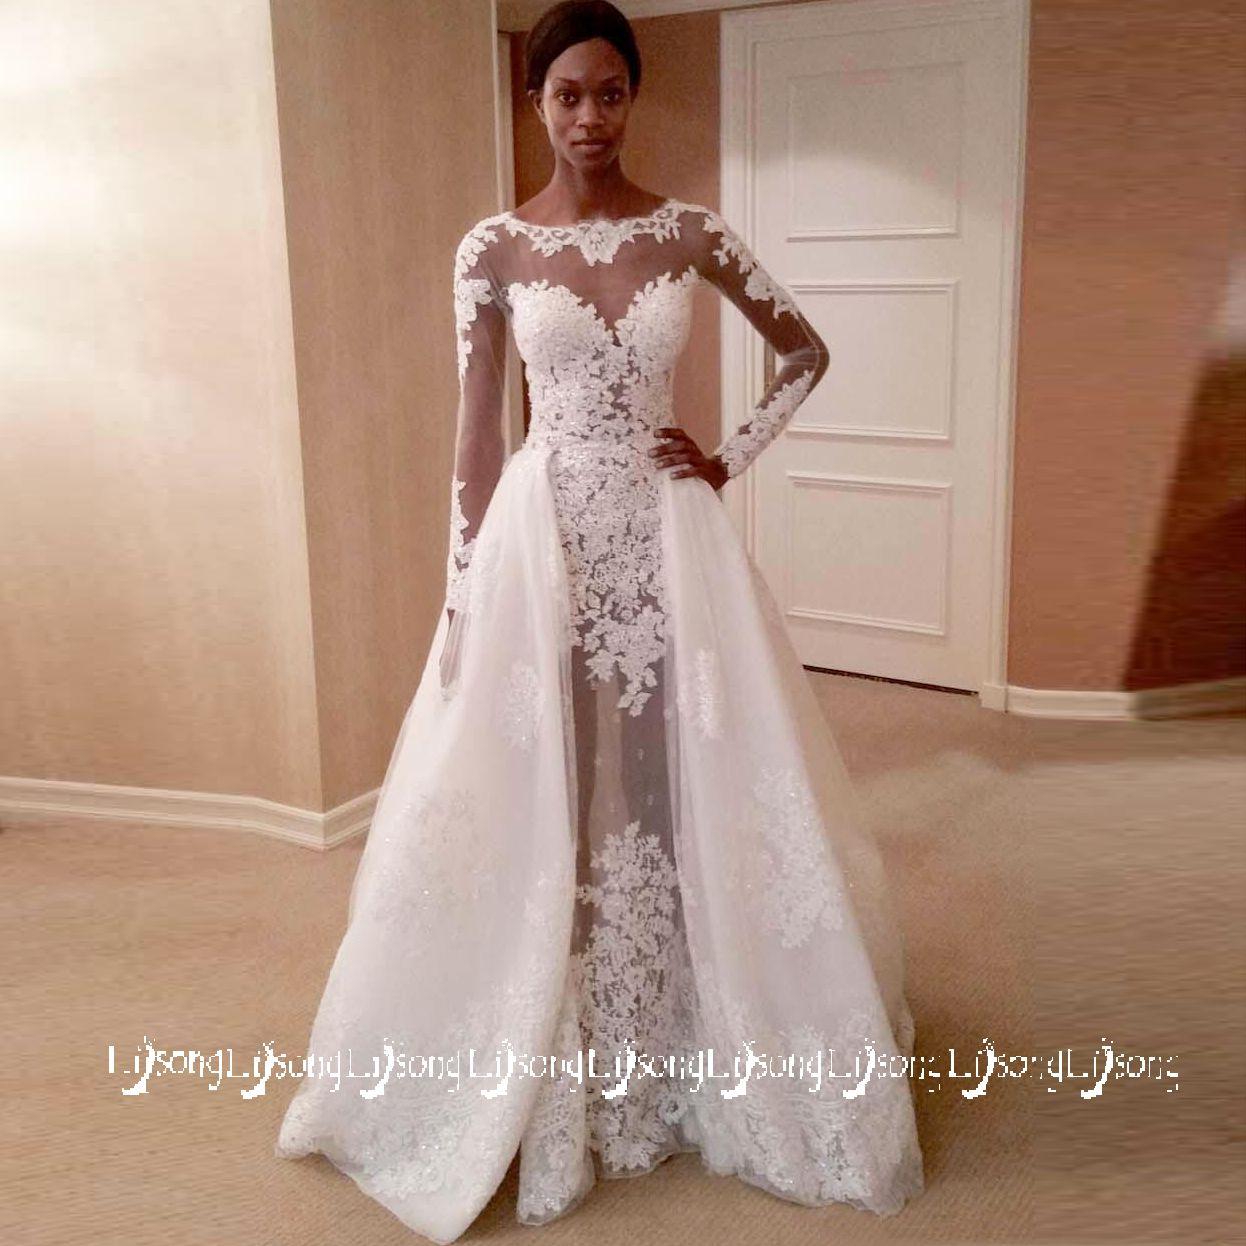 a62c0efe893 Discount 2018 White Lace Wedding Dress A Line Full Sleeves Bridal Maxi Gowns  Vestido De Casamento Scoop Brides Long Formal Party Dresses Dark Skin  Wedding ...